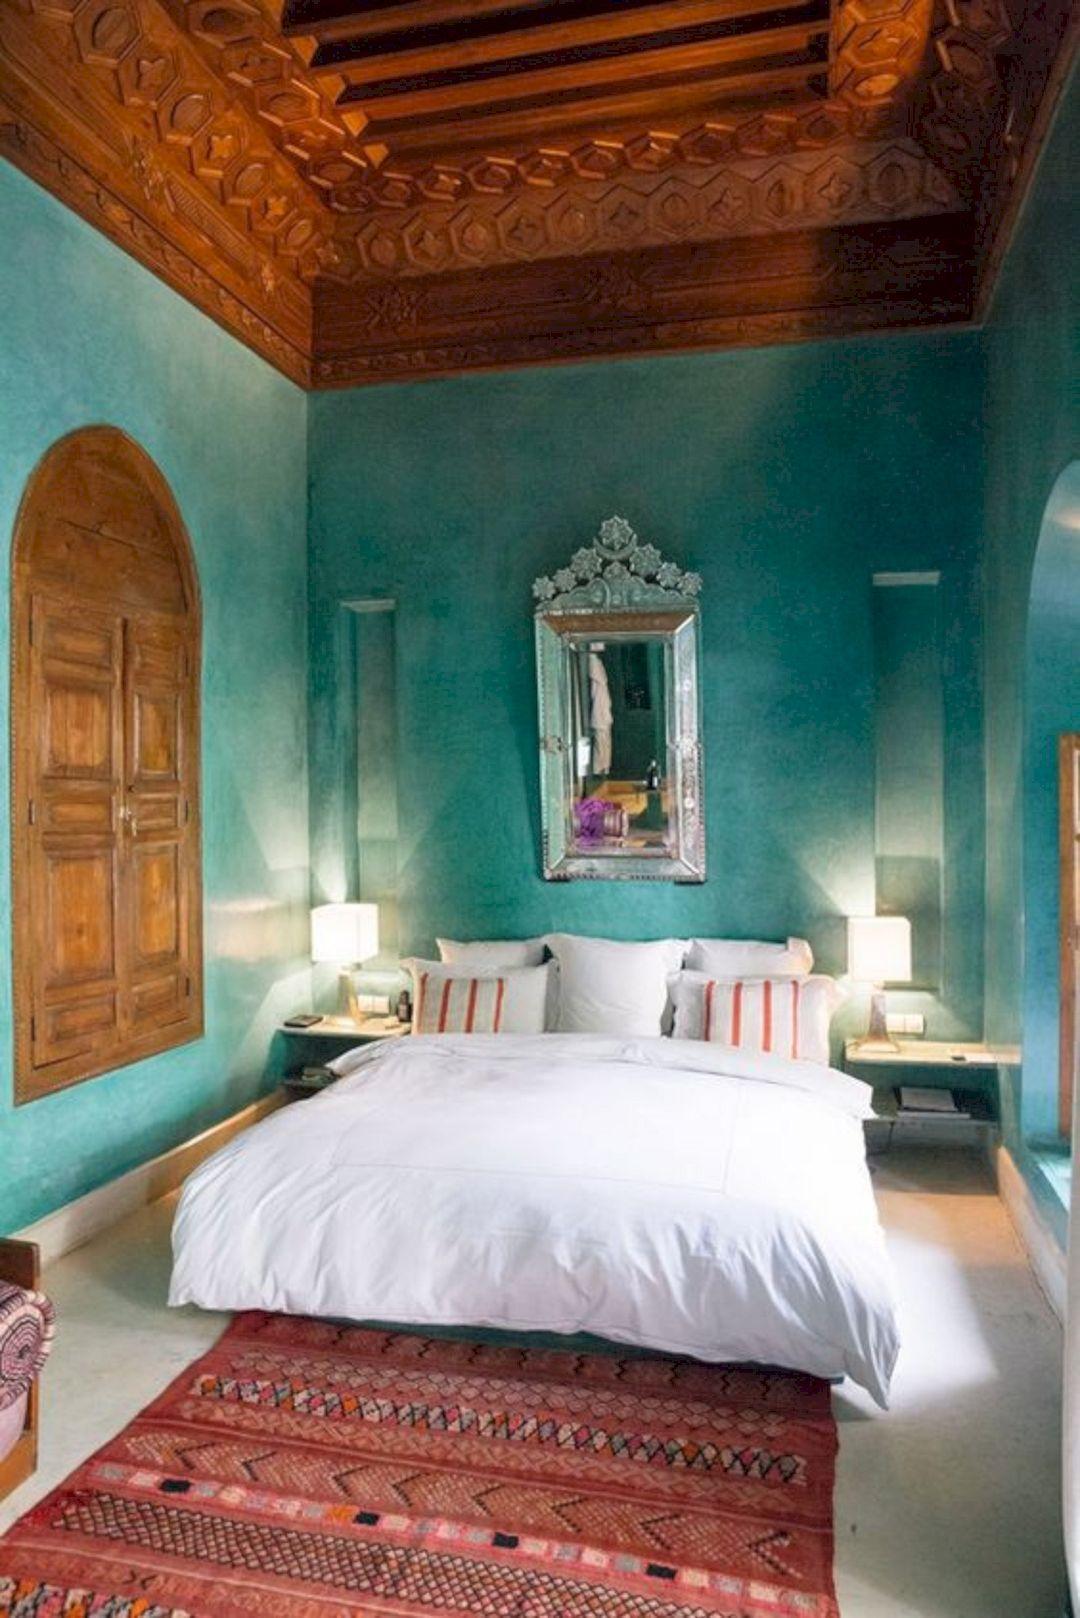 16 Moroccan Home Decoration Ideas | Moroccan decor | Pinterest ...